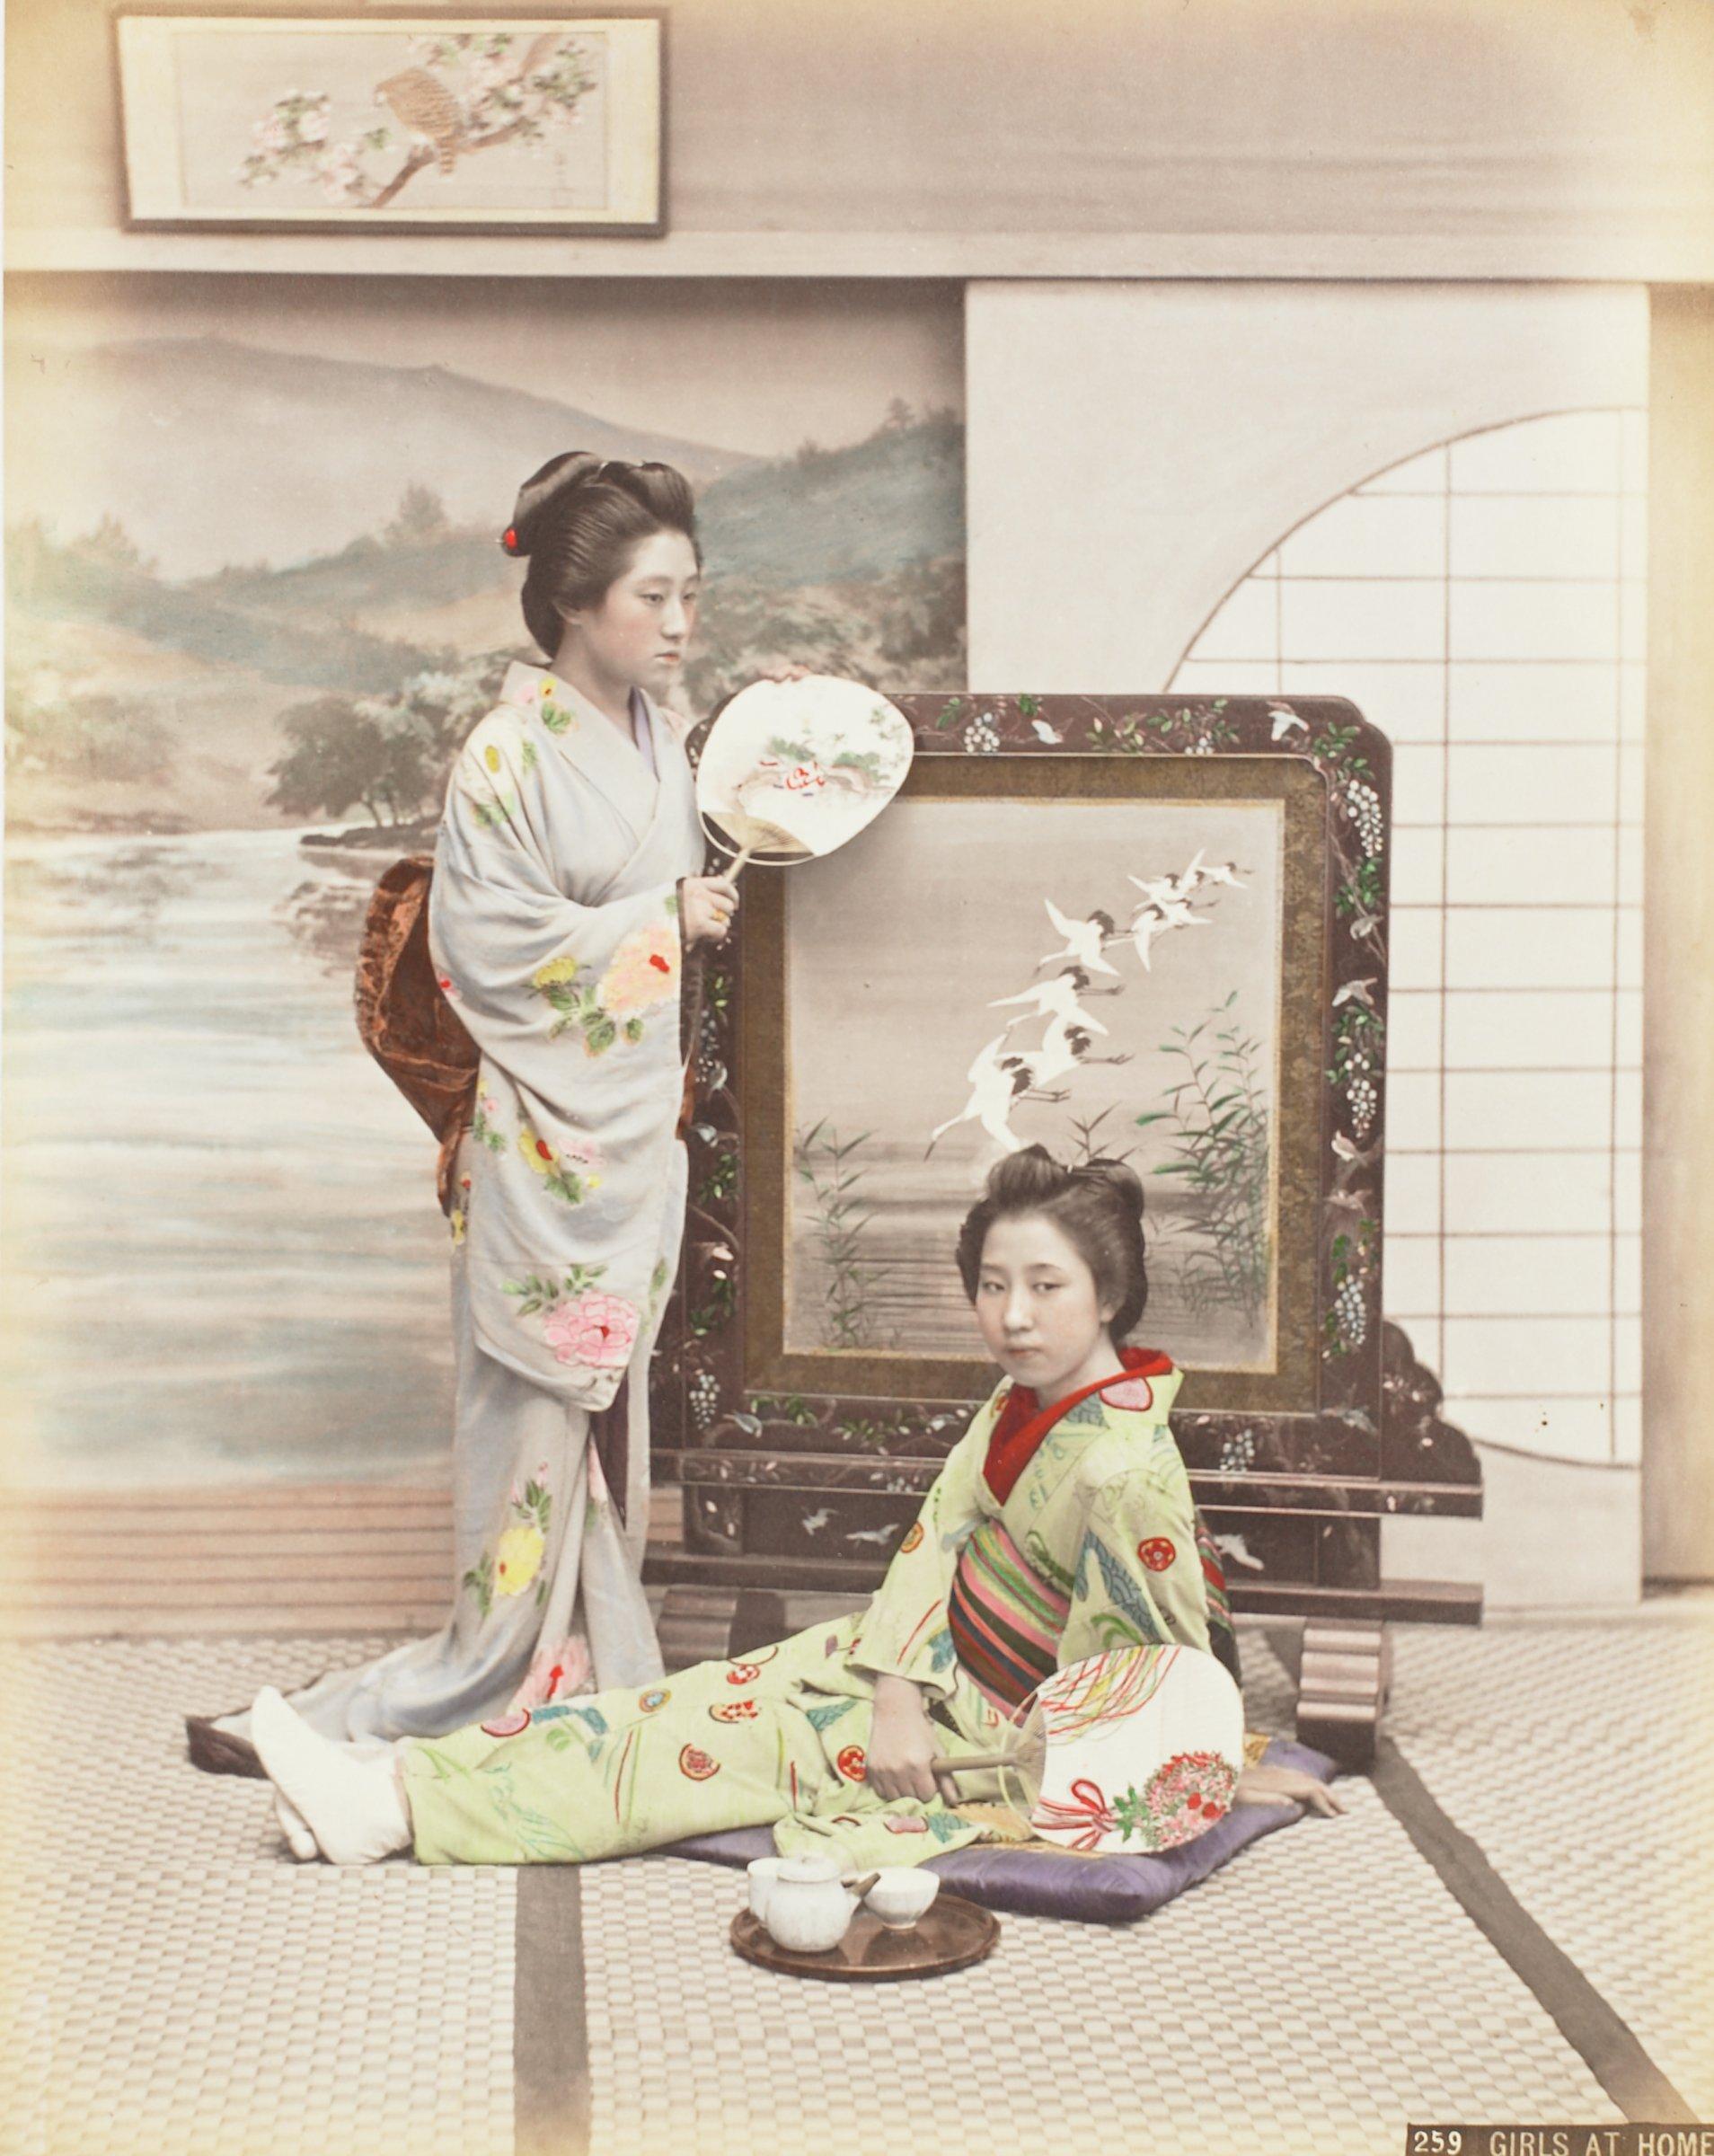 Girls At Home (.8, recto); Jinrikishia (.9, verso), Attributed to Kusakabe Kimbei, hand-colored albumen prints mounted to album page